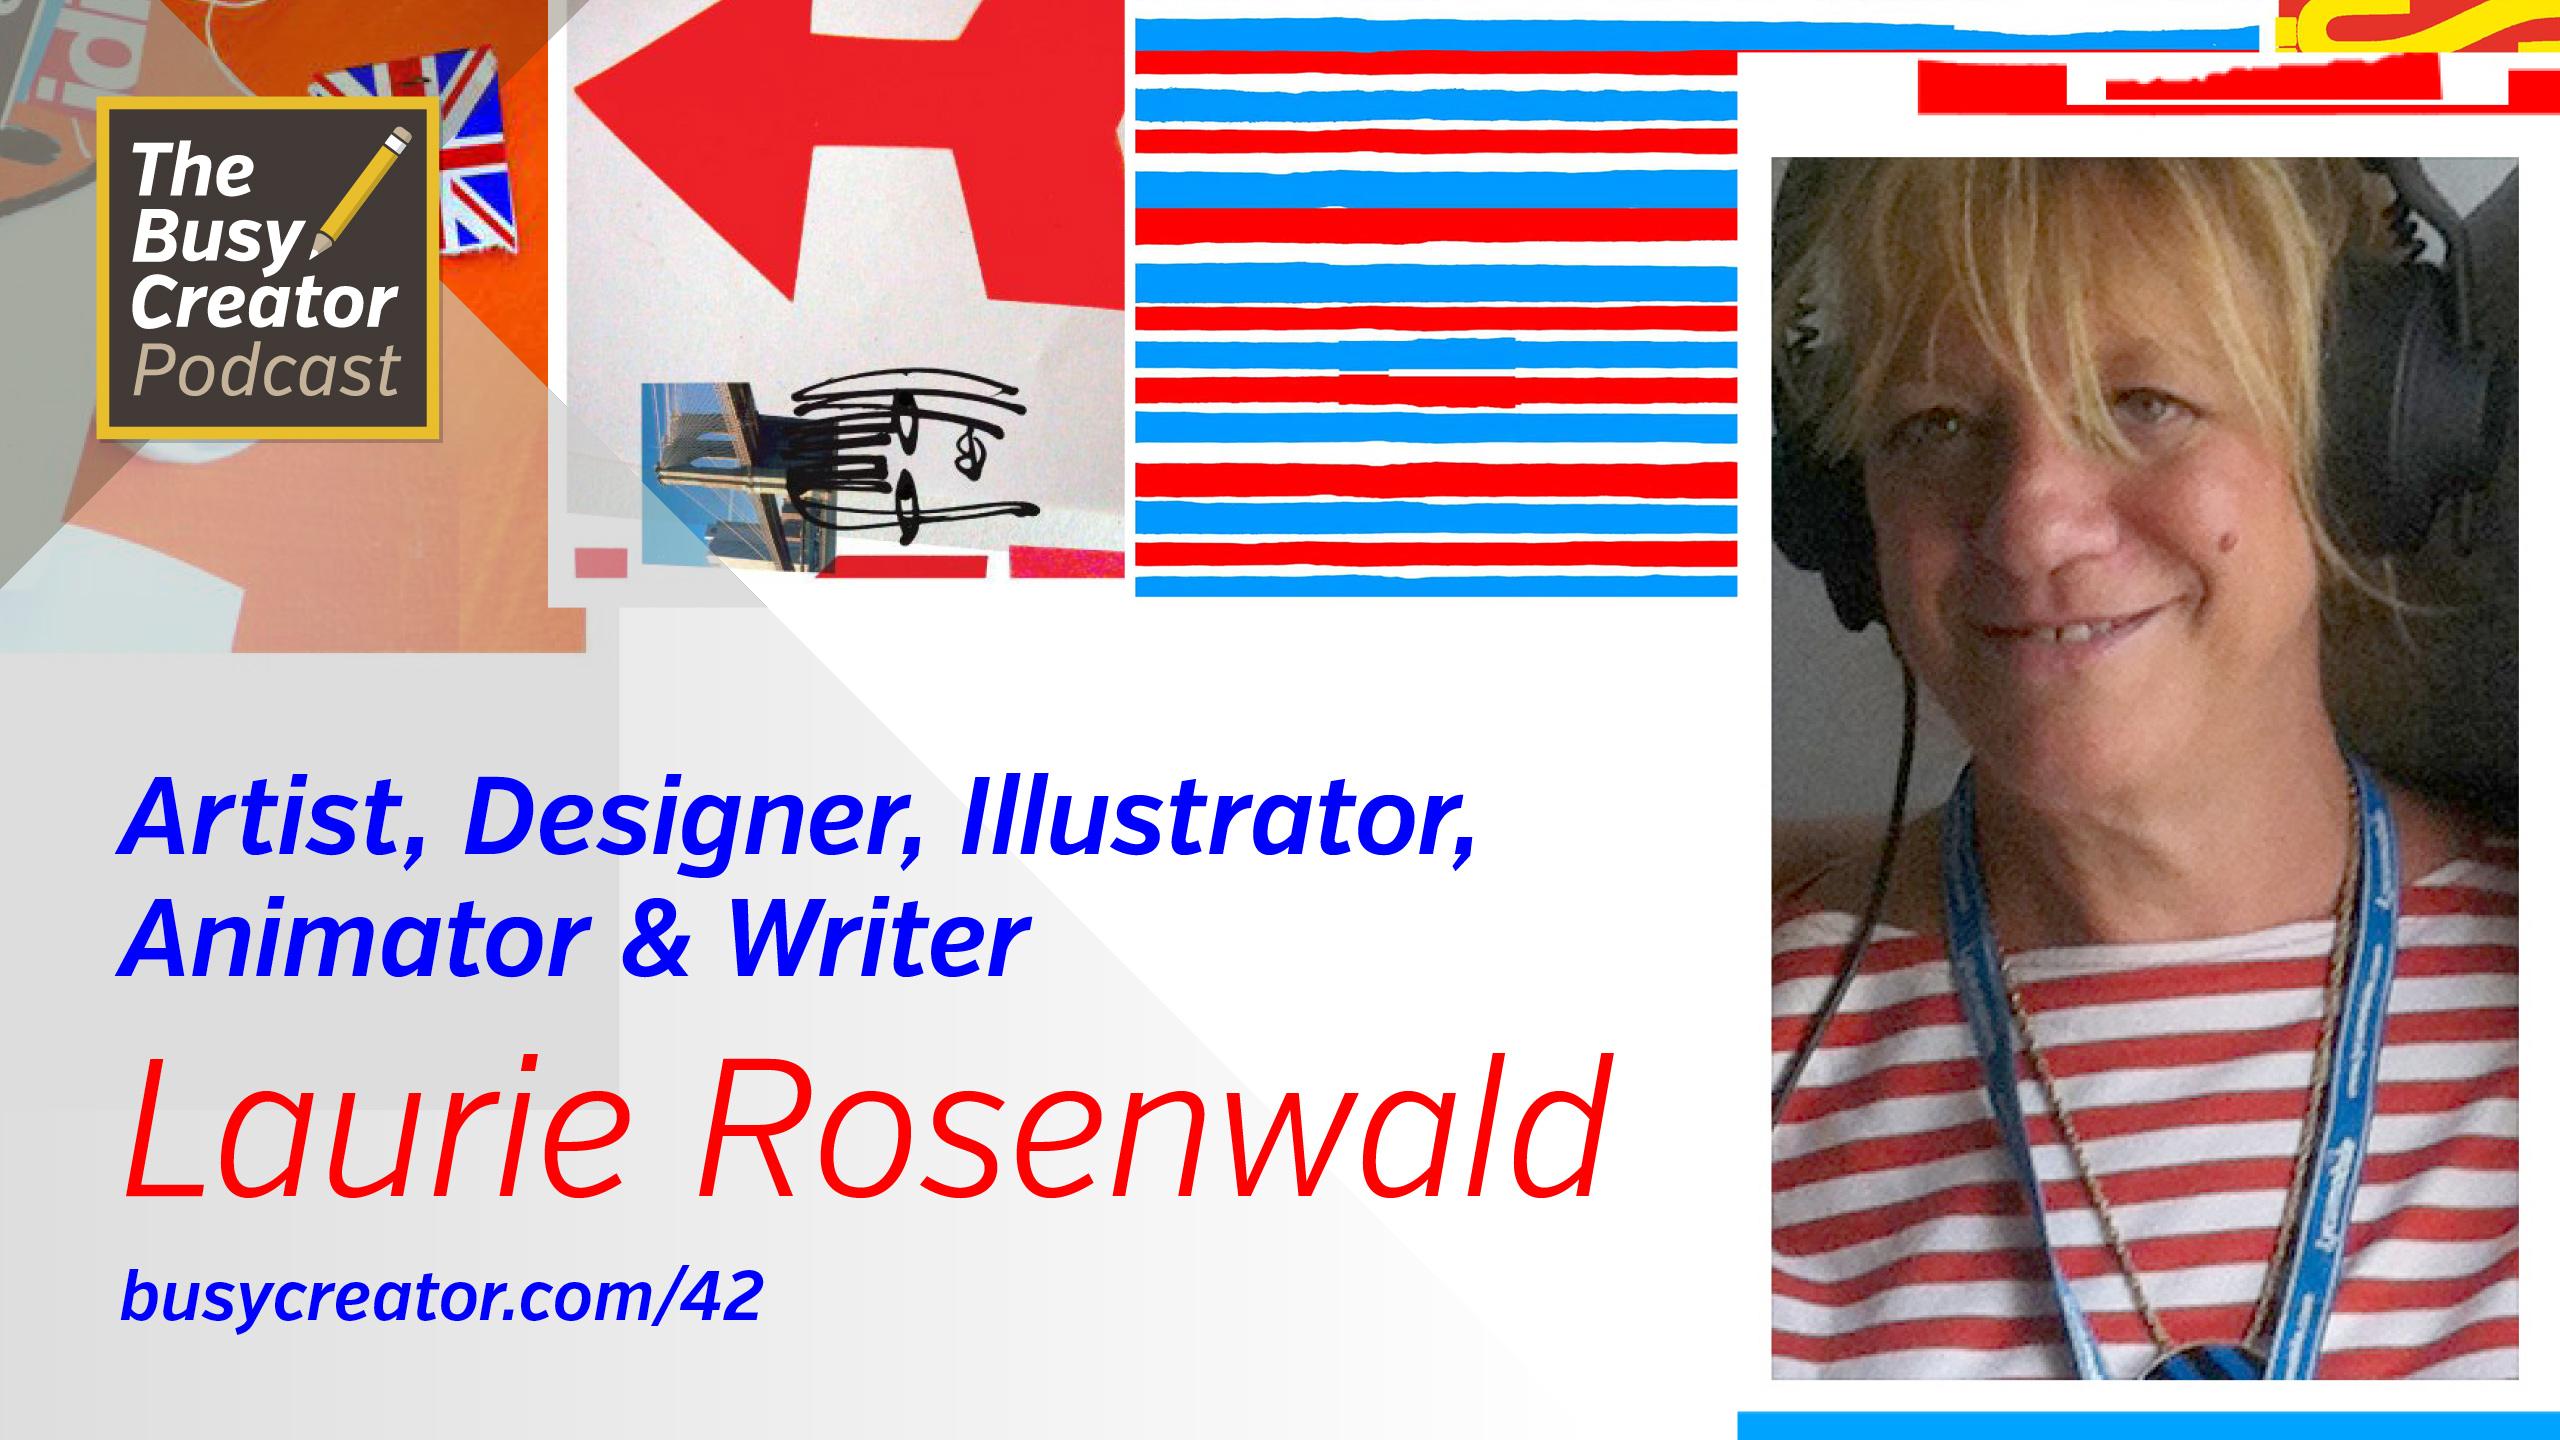 The Process and Habits of Artist, Designer, Illustrator, Animator & Writer Laurie Rosenwald